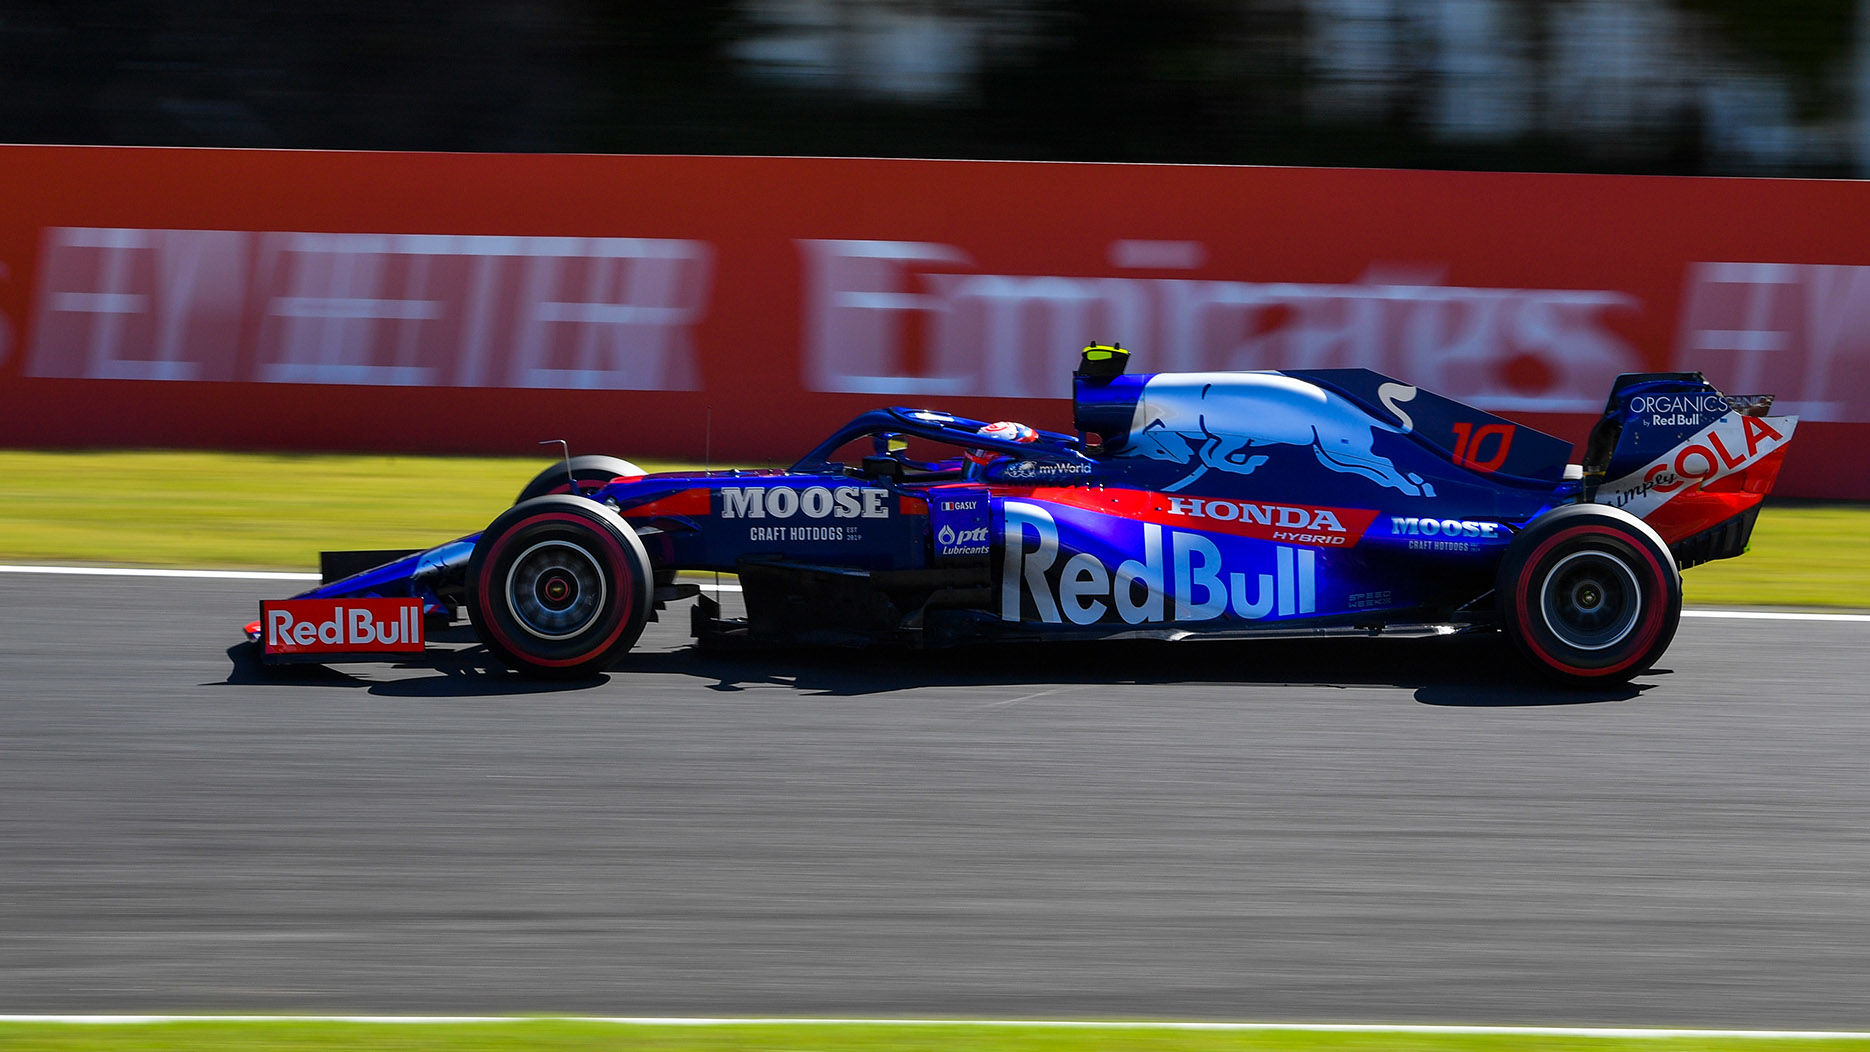 F1 Formula 1 Formula One Toro Rosso Red Bull Racing Honda